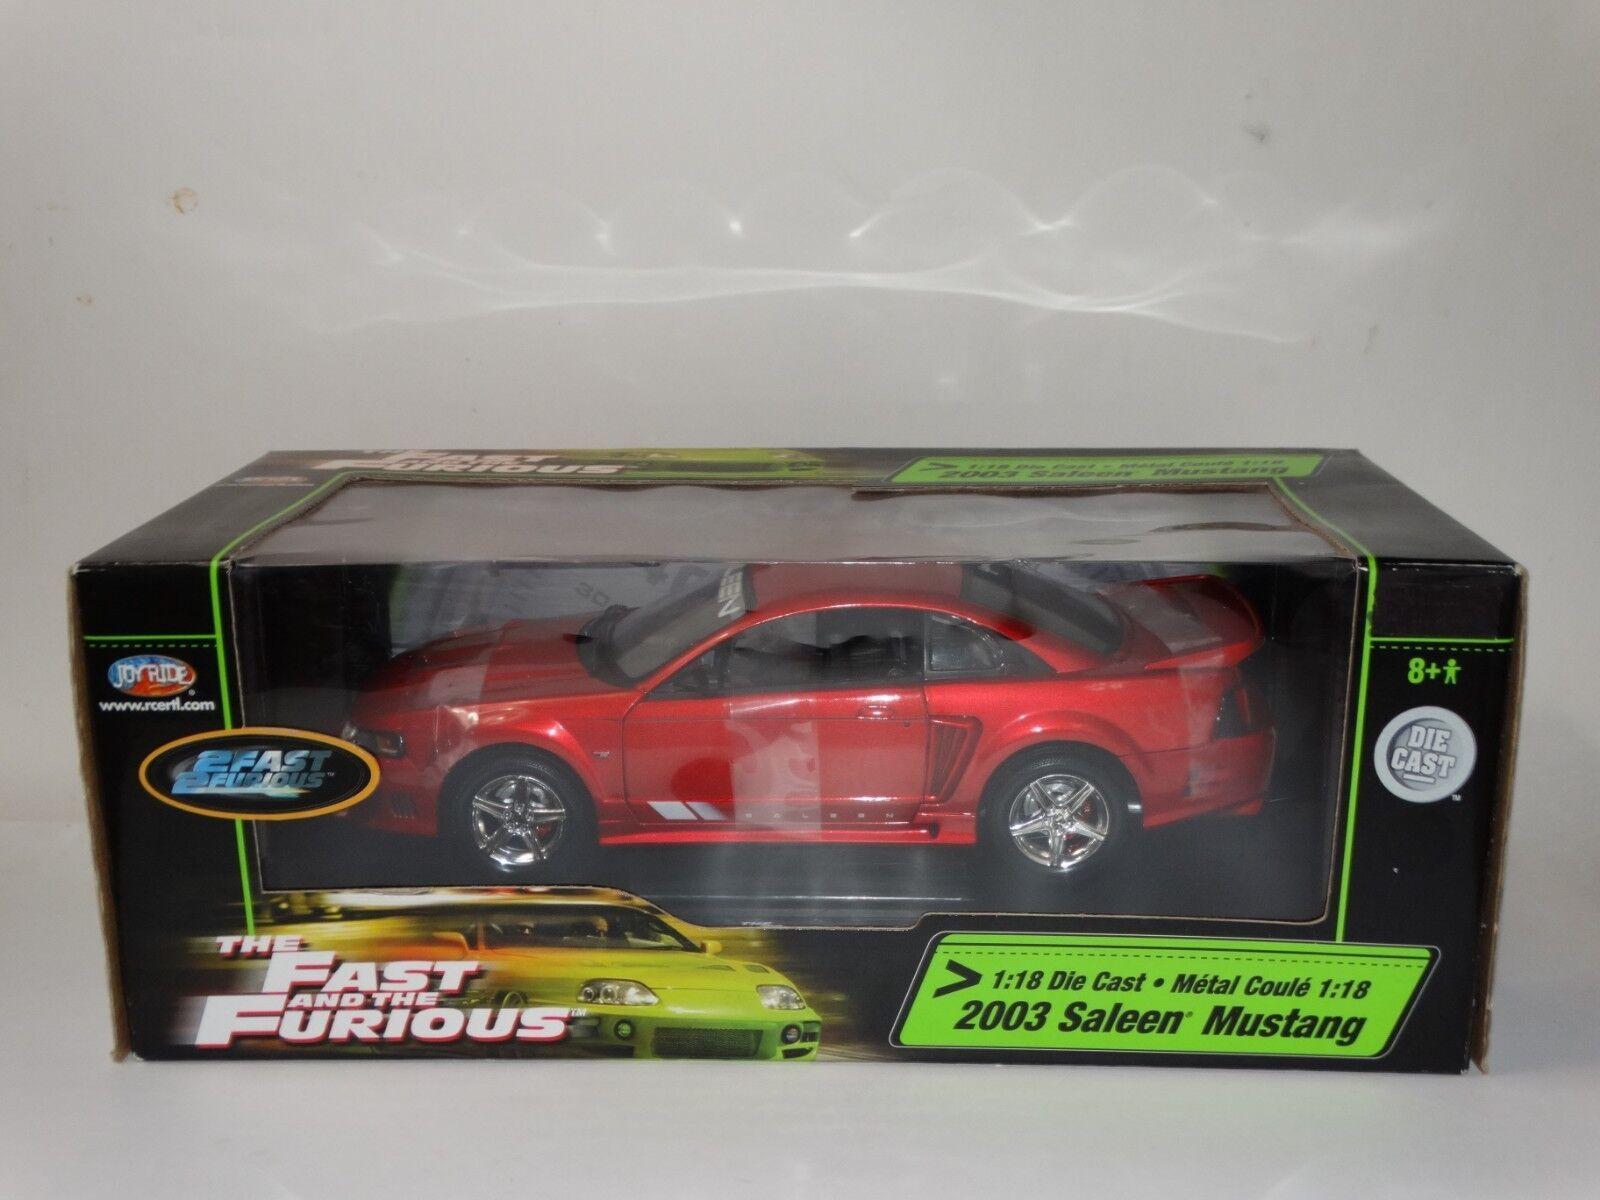 ERTL Joyride rapide et furieux 2003 Ford Saleen Mustang échelle 1 18 Diecast Voiture